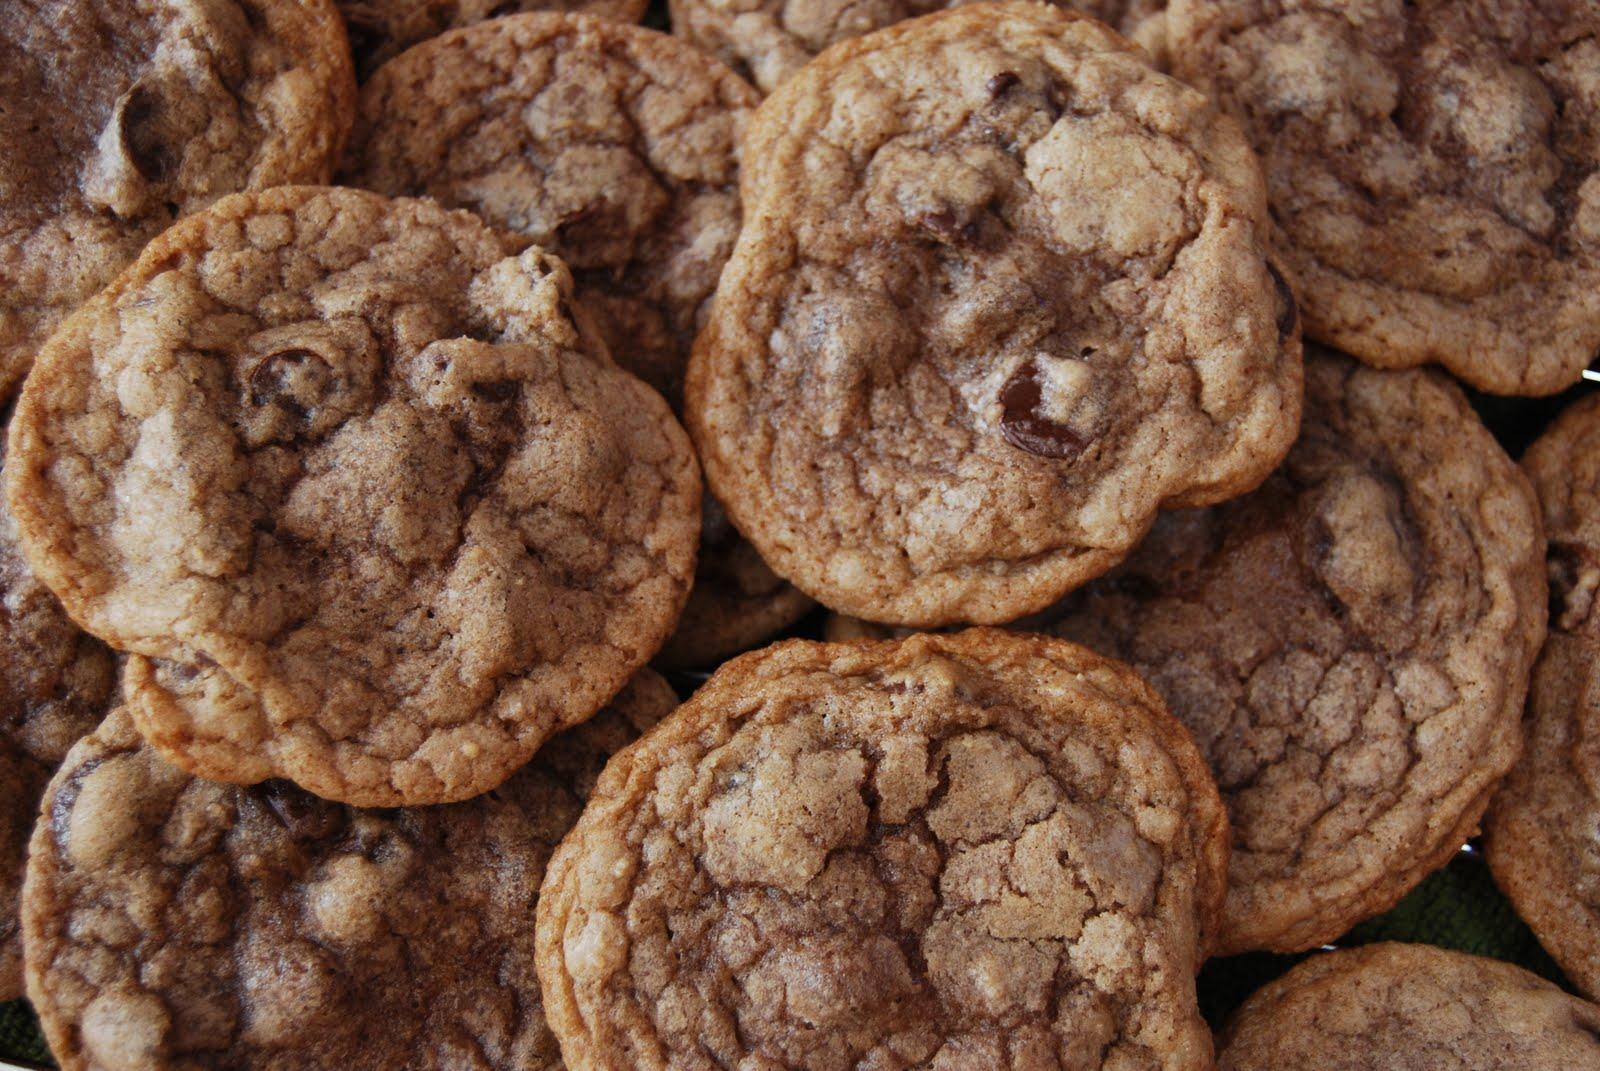 Nutella Chocolate Chip Cookies - Macaroni and Cheesecake